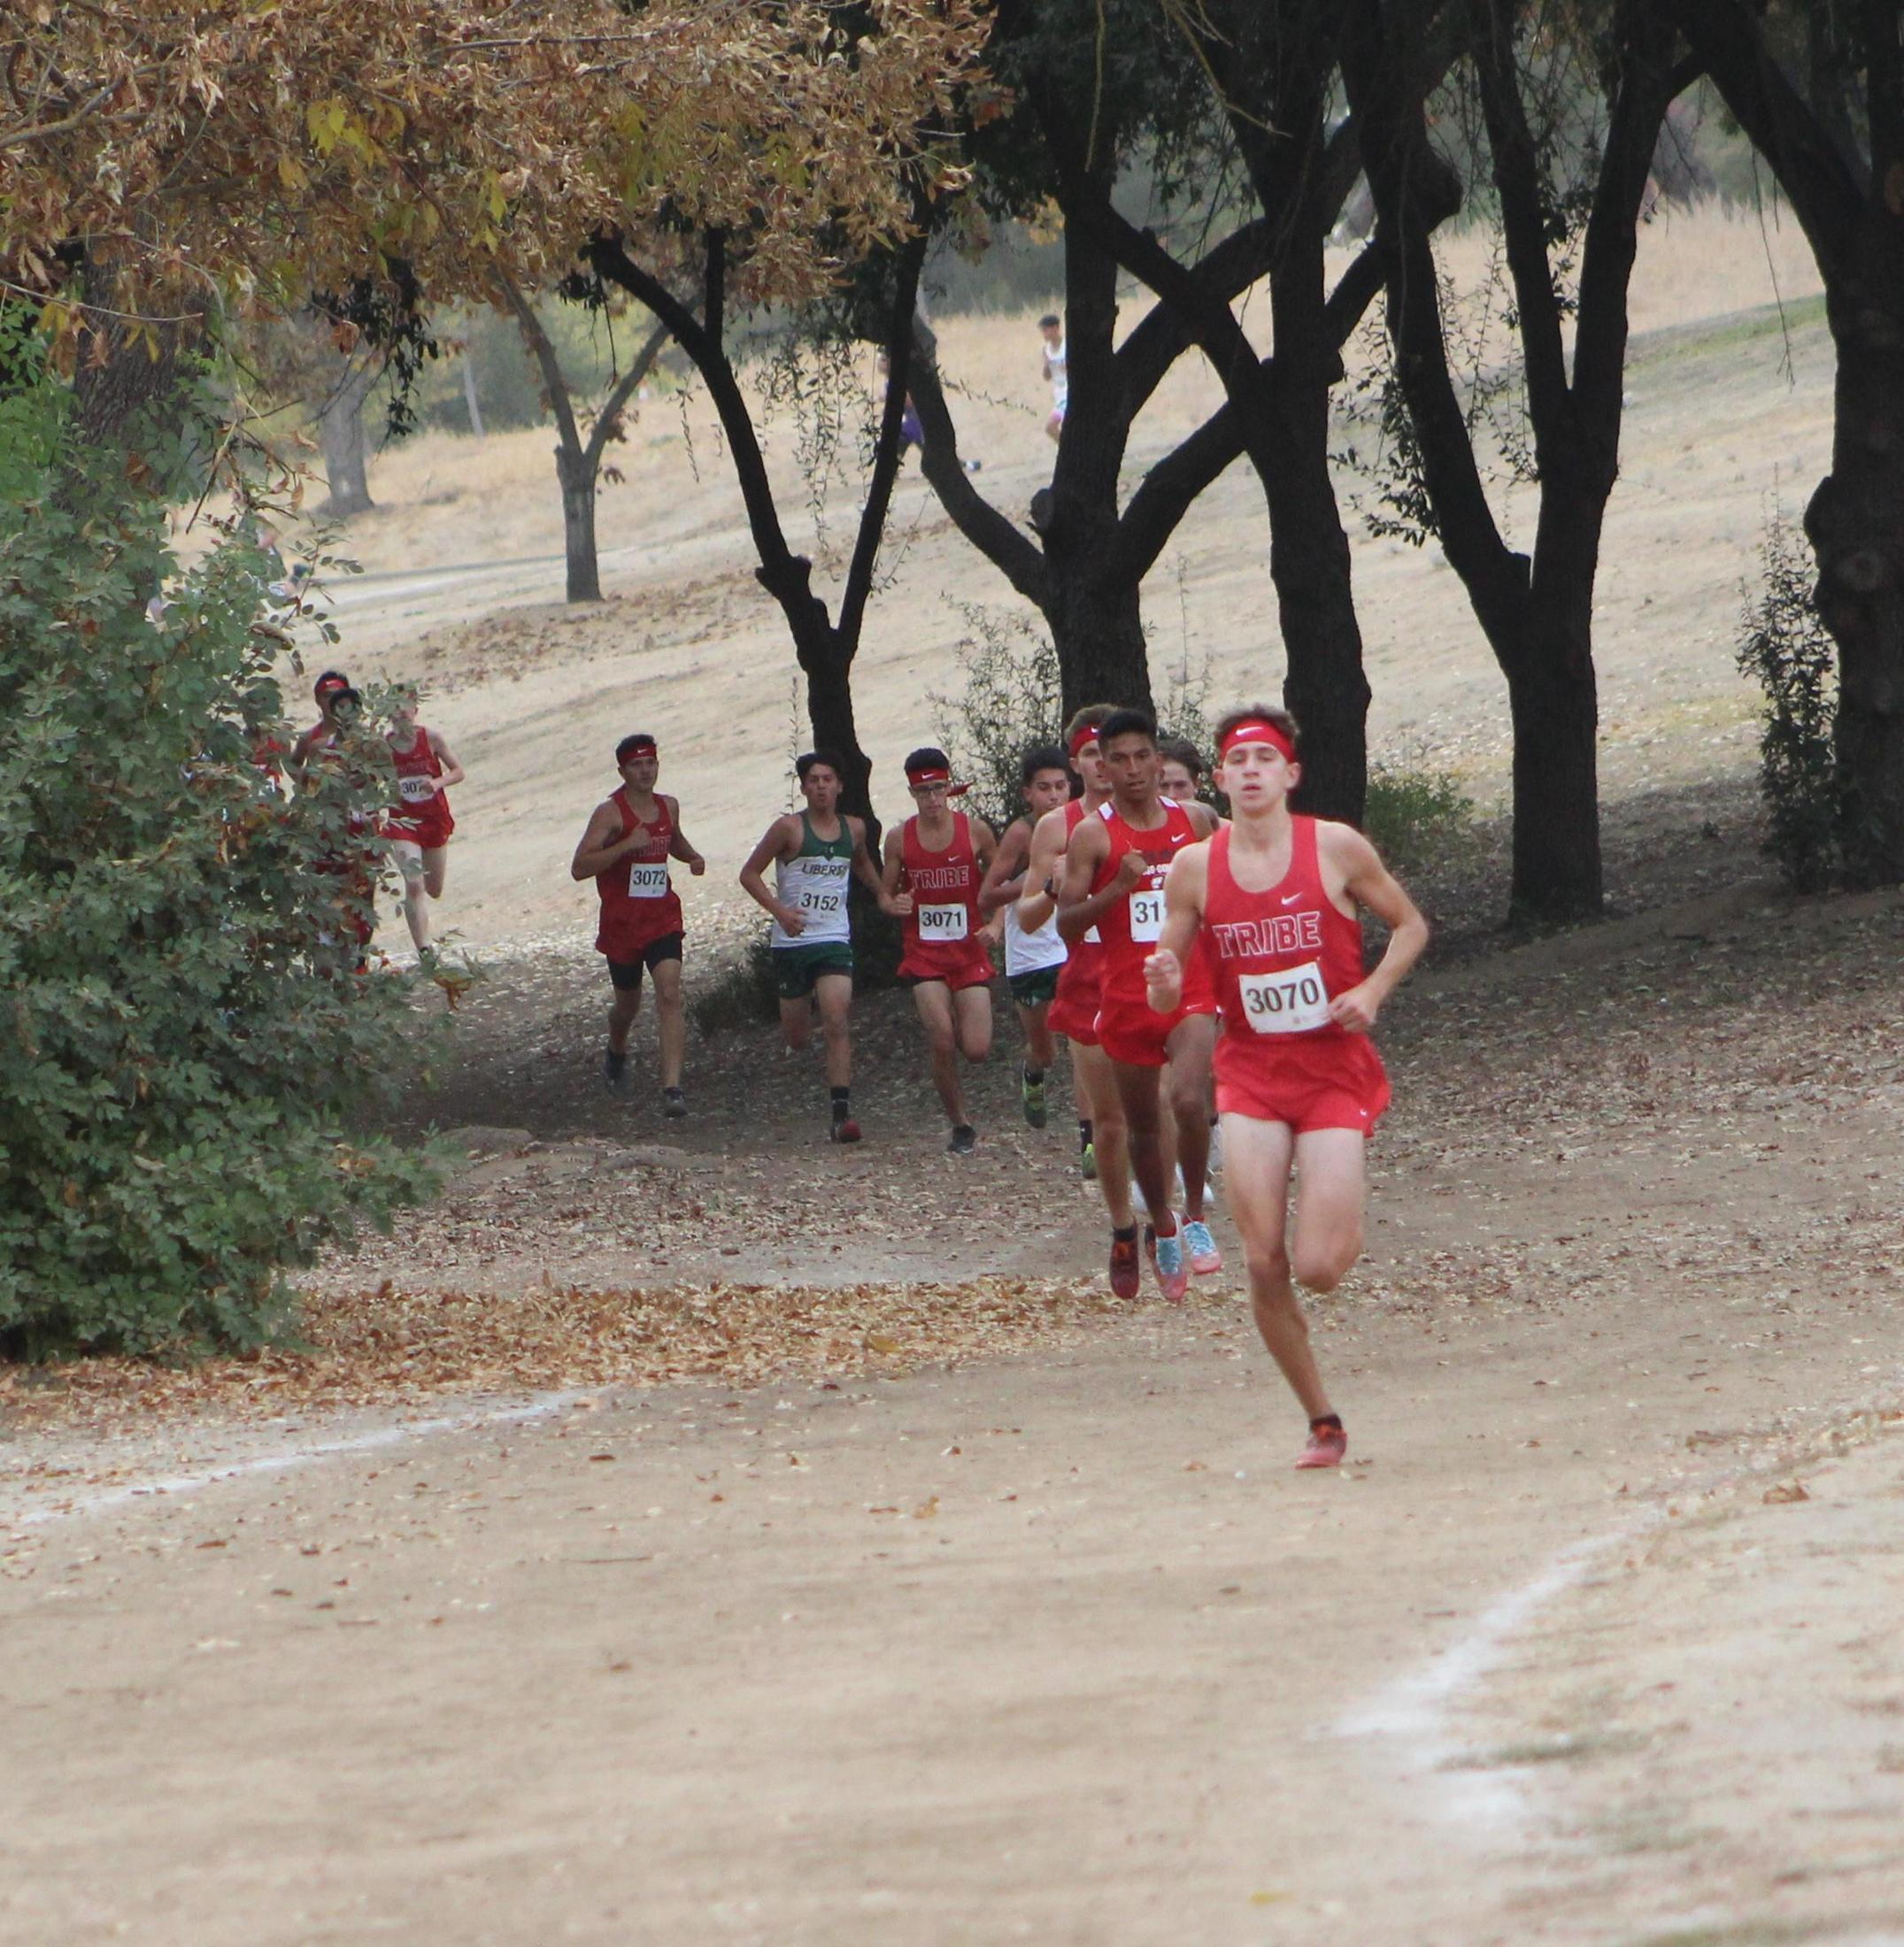 Connor Borba leads the race